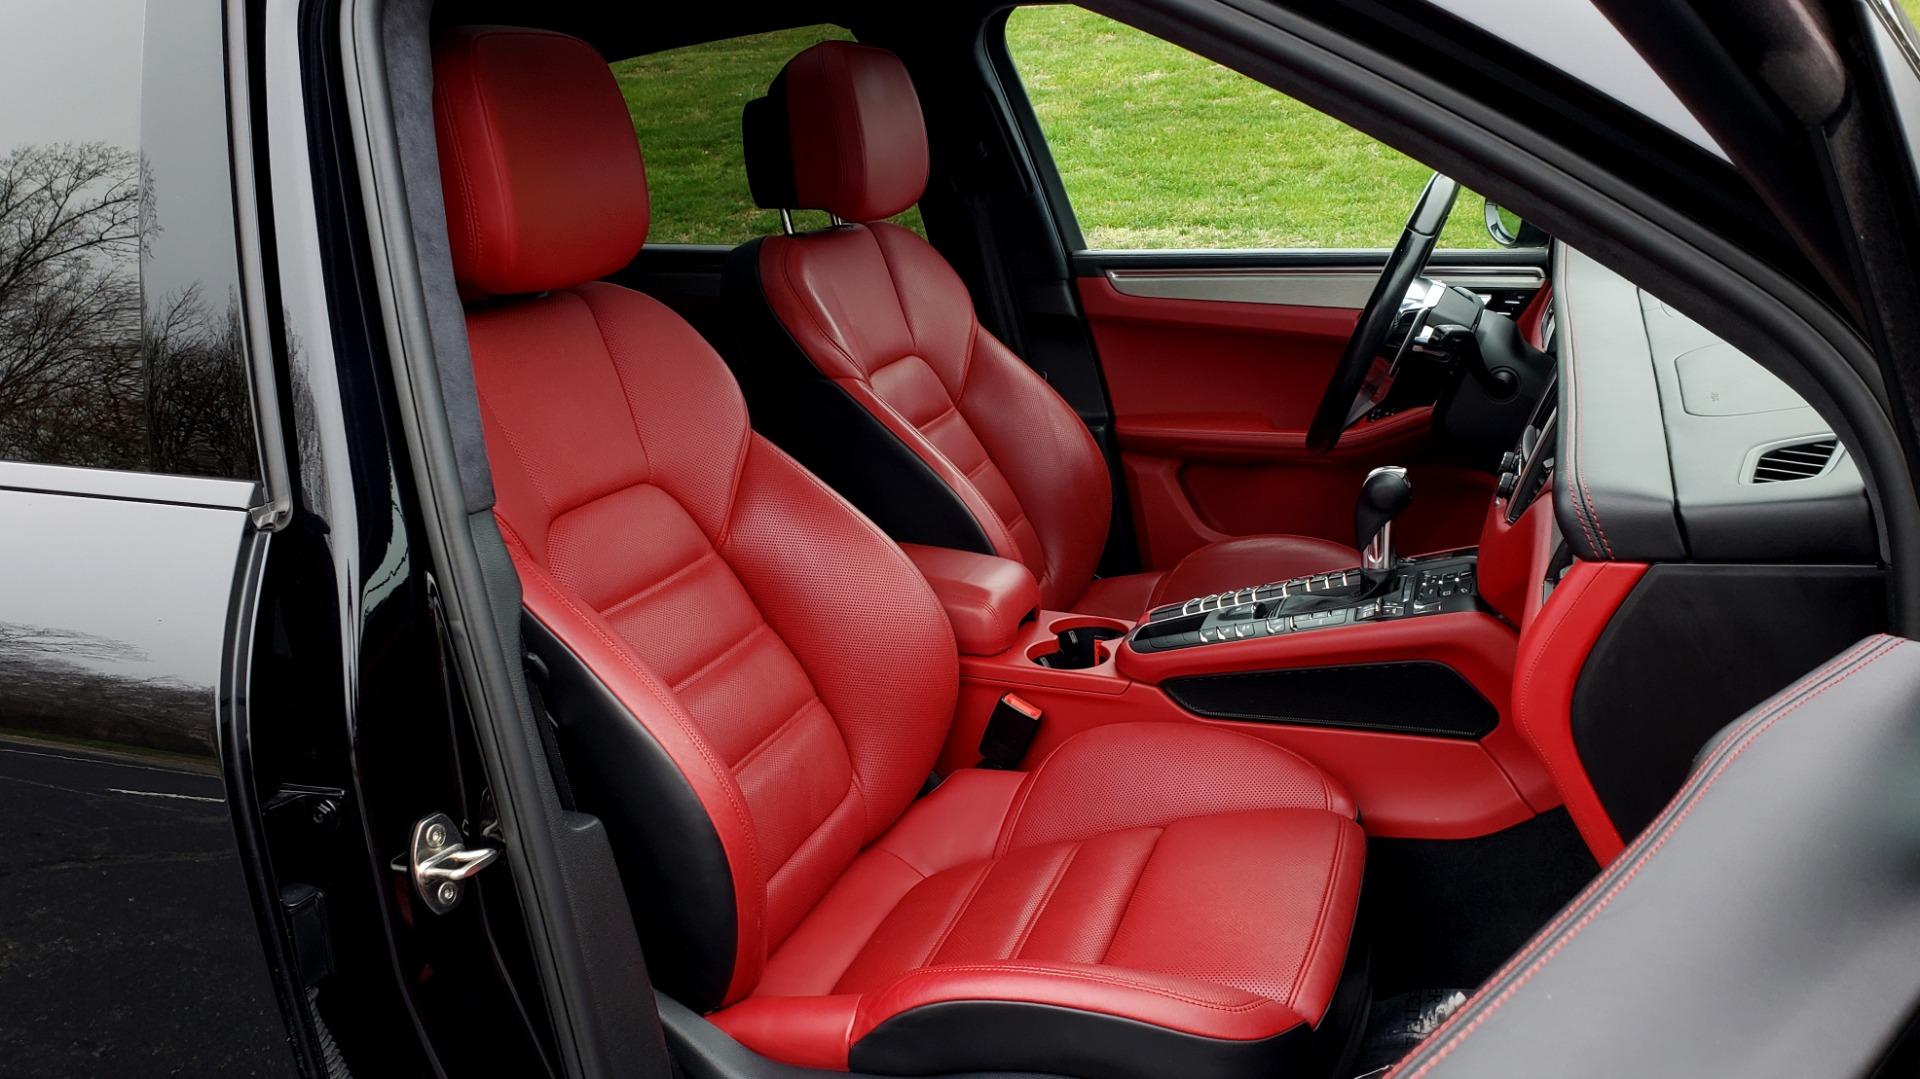 Used 2016 Porsche MACAN TURBO / PREM / NAV / PARK ASST / BOSE / PDK / CHRONO PKG for sale Sold at Formula Imports in Charlotte NC 28227 71